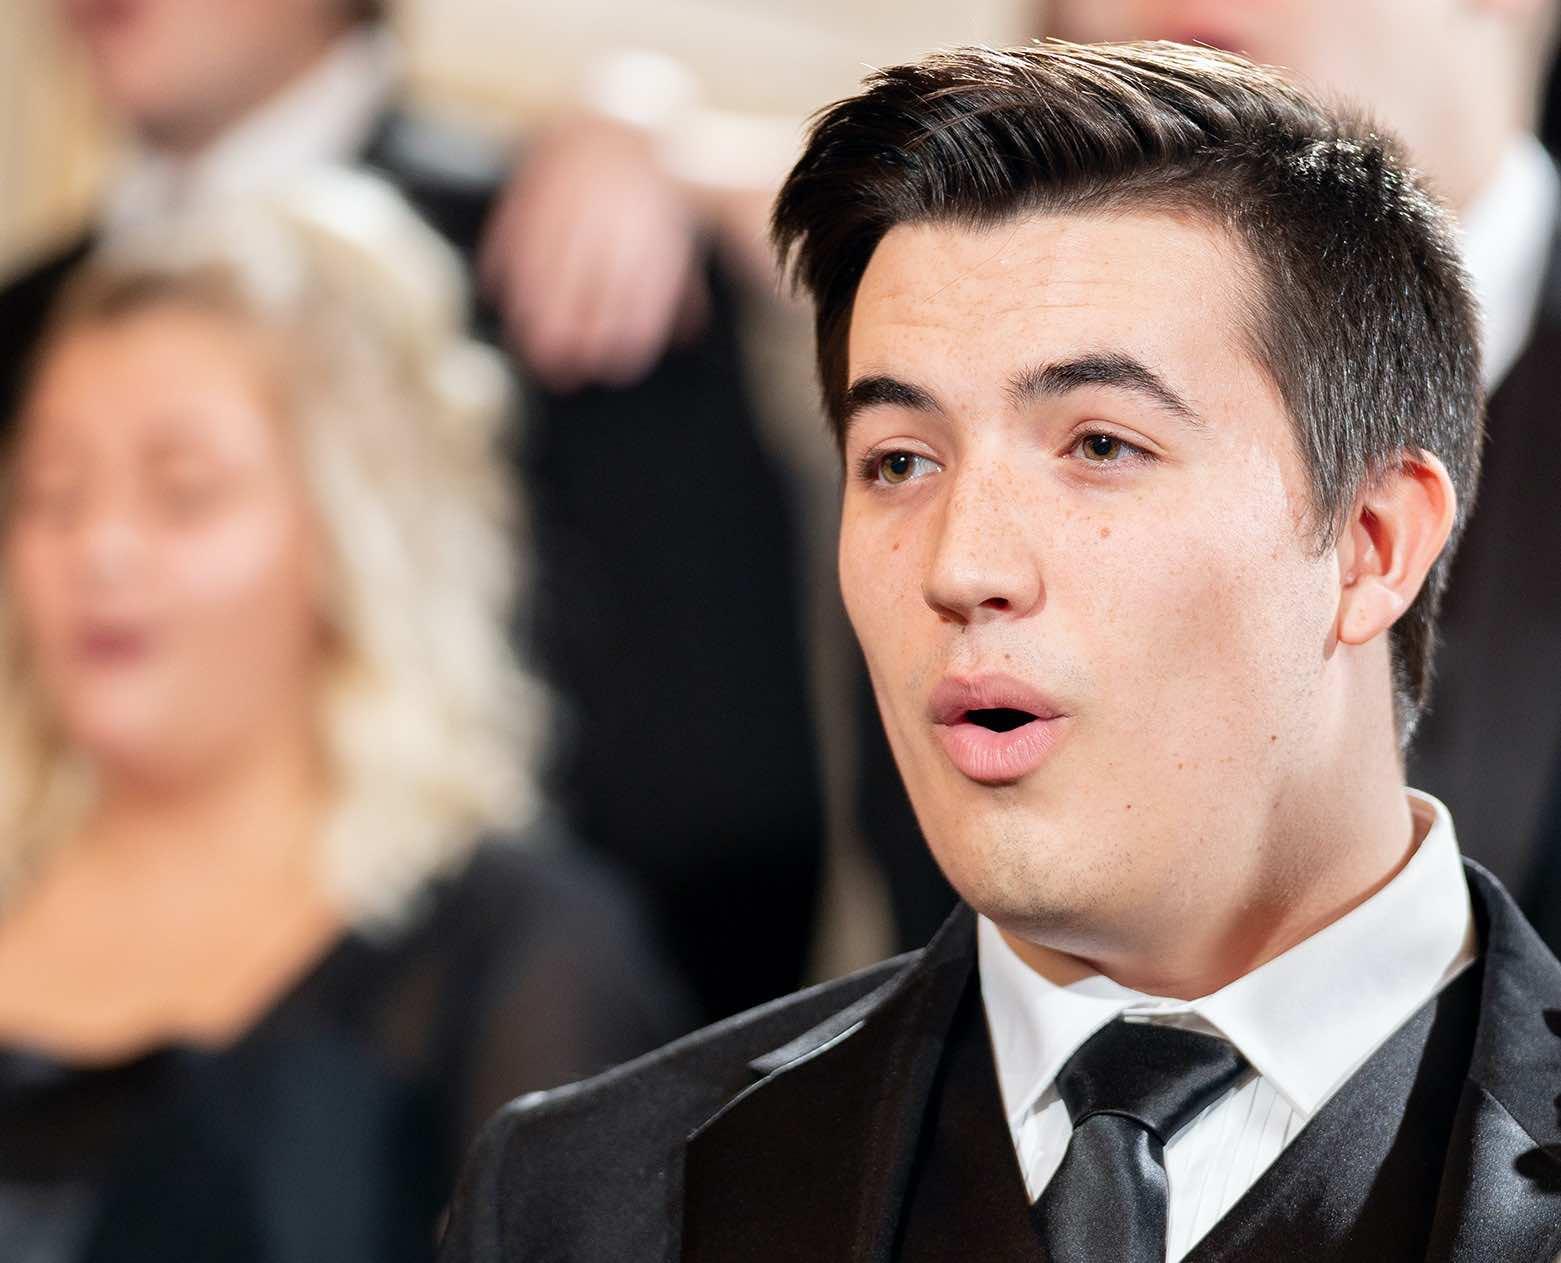 Man singing in choir